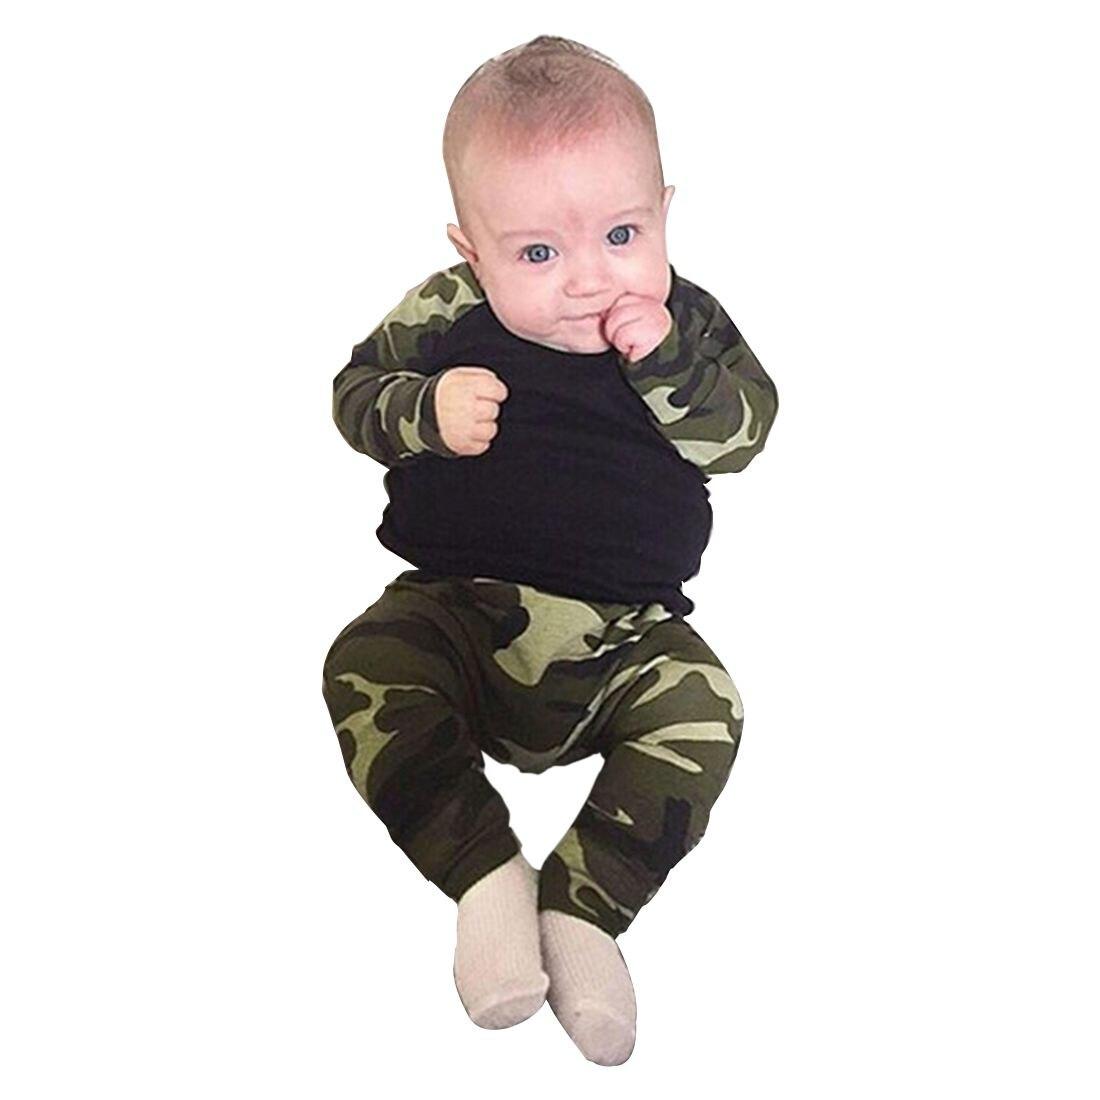 Cute Newborn Baby Boys Kids T-shirt Top+Long Pants Outfit Clothes Set, Black&camouflage 70cm